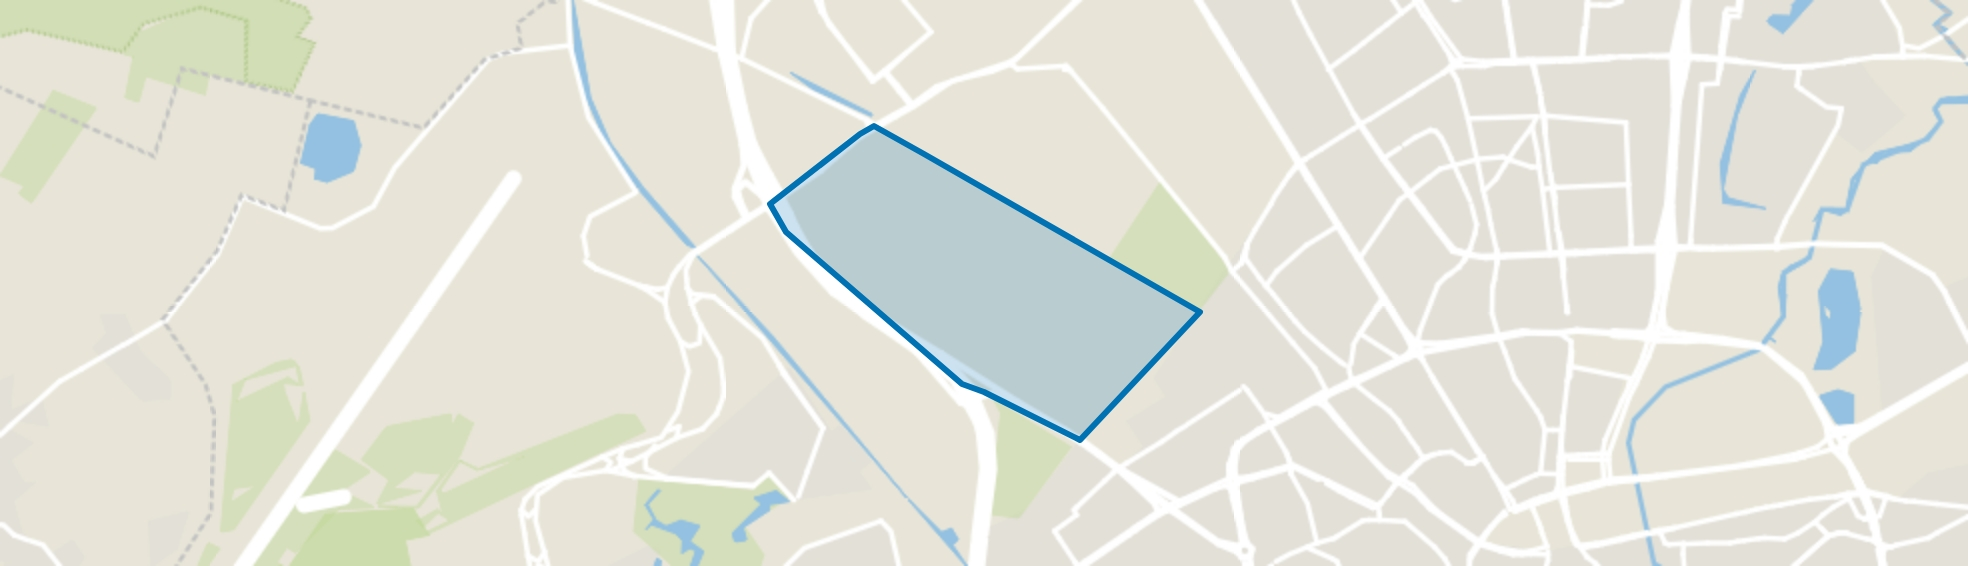 Wielewaal, Eindhoven map